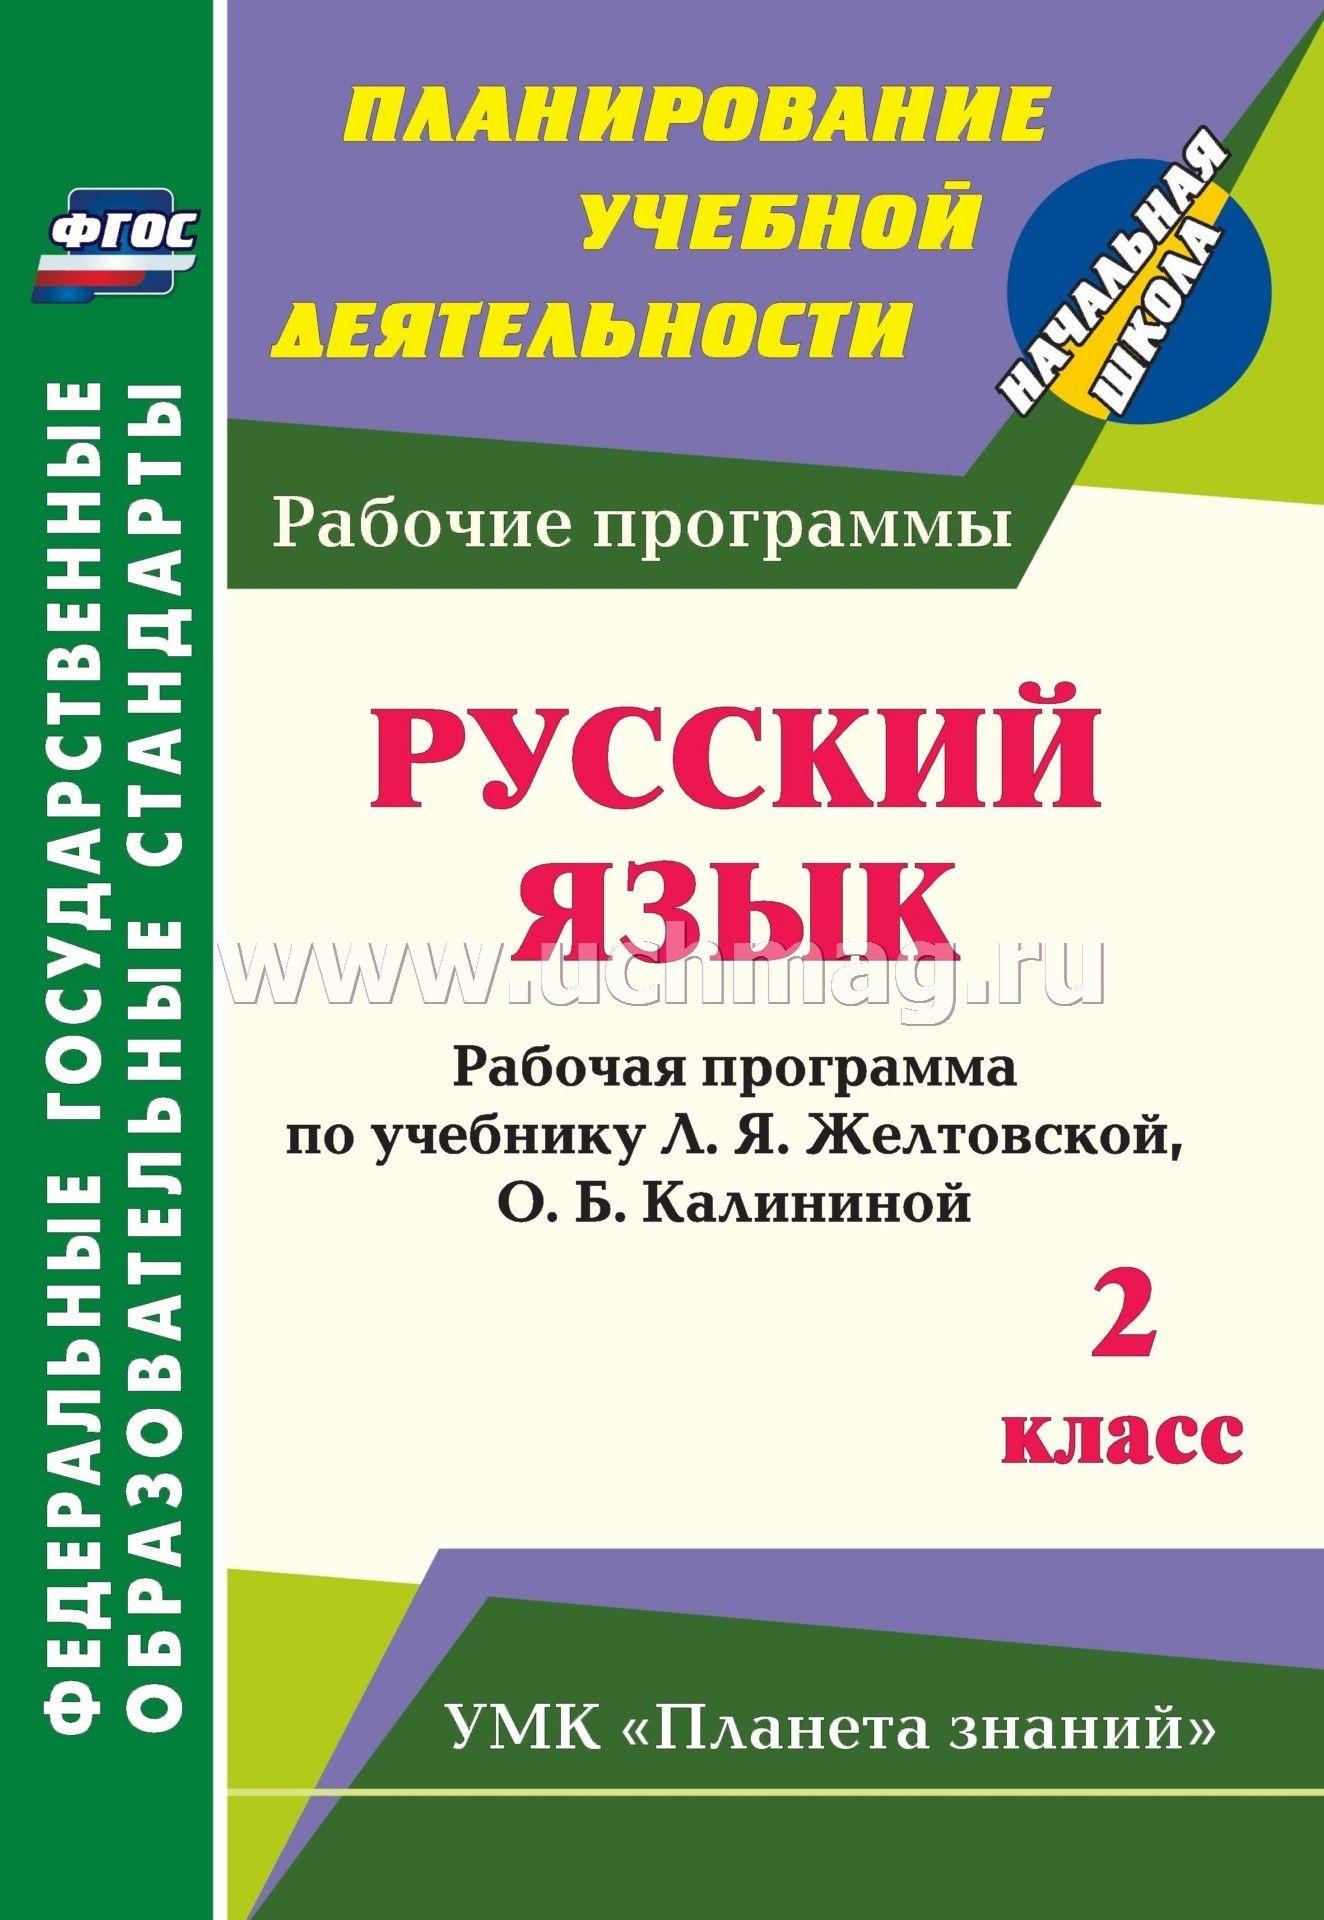 Рабочая программа с ууд по русскому языку 2 класс